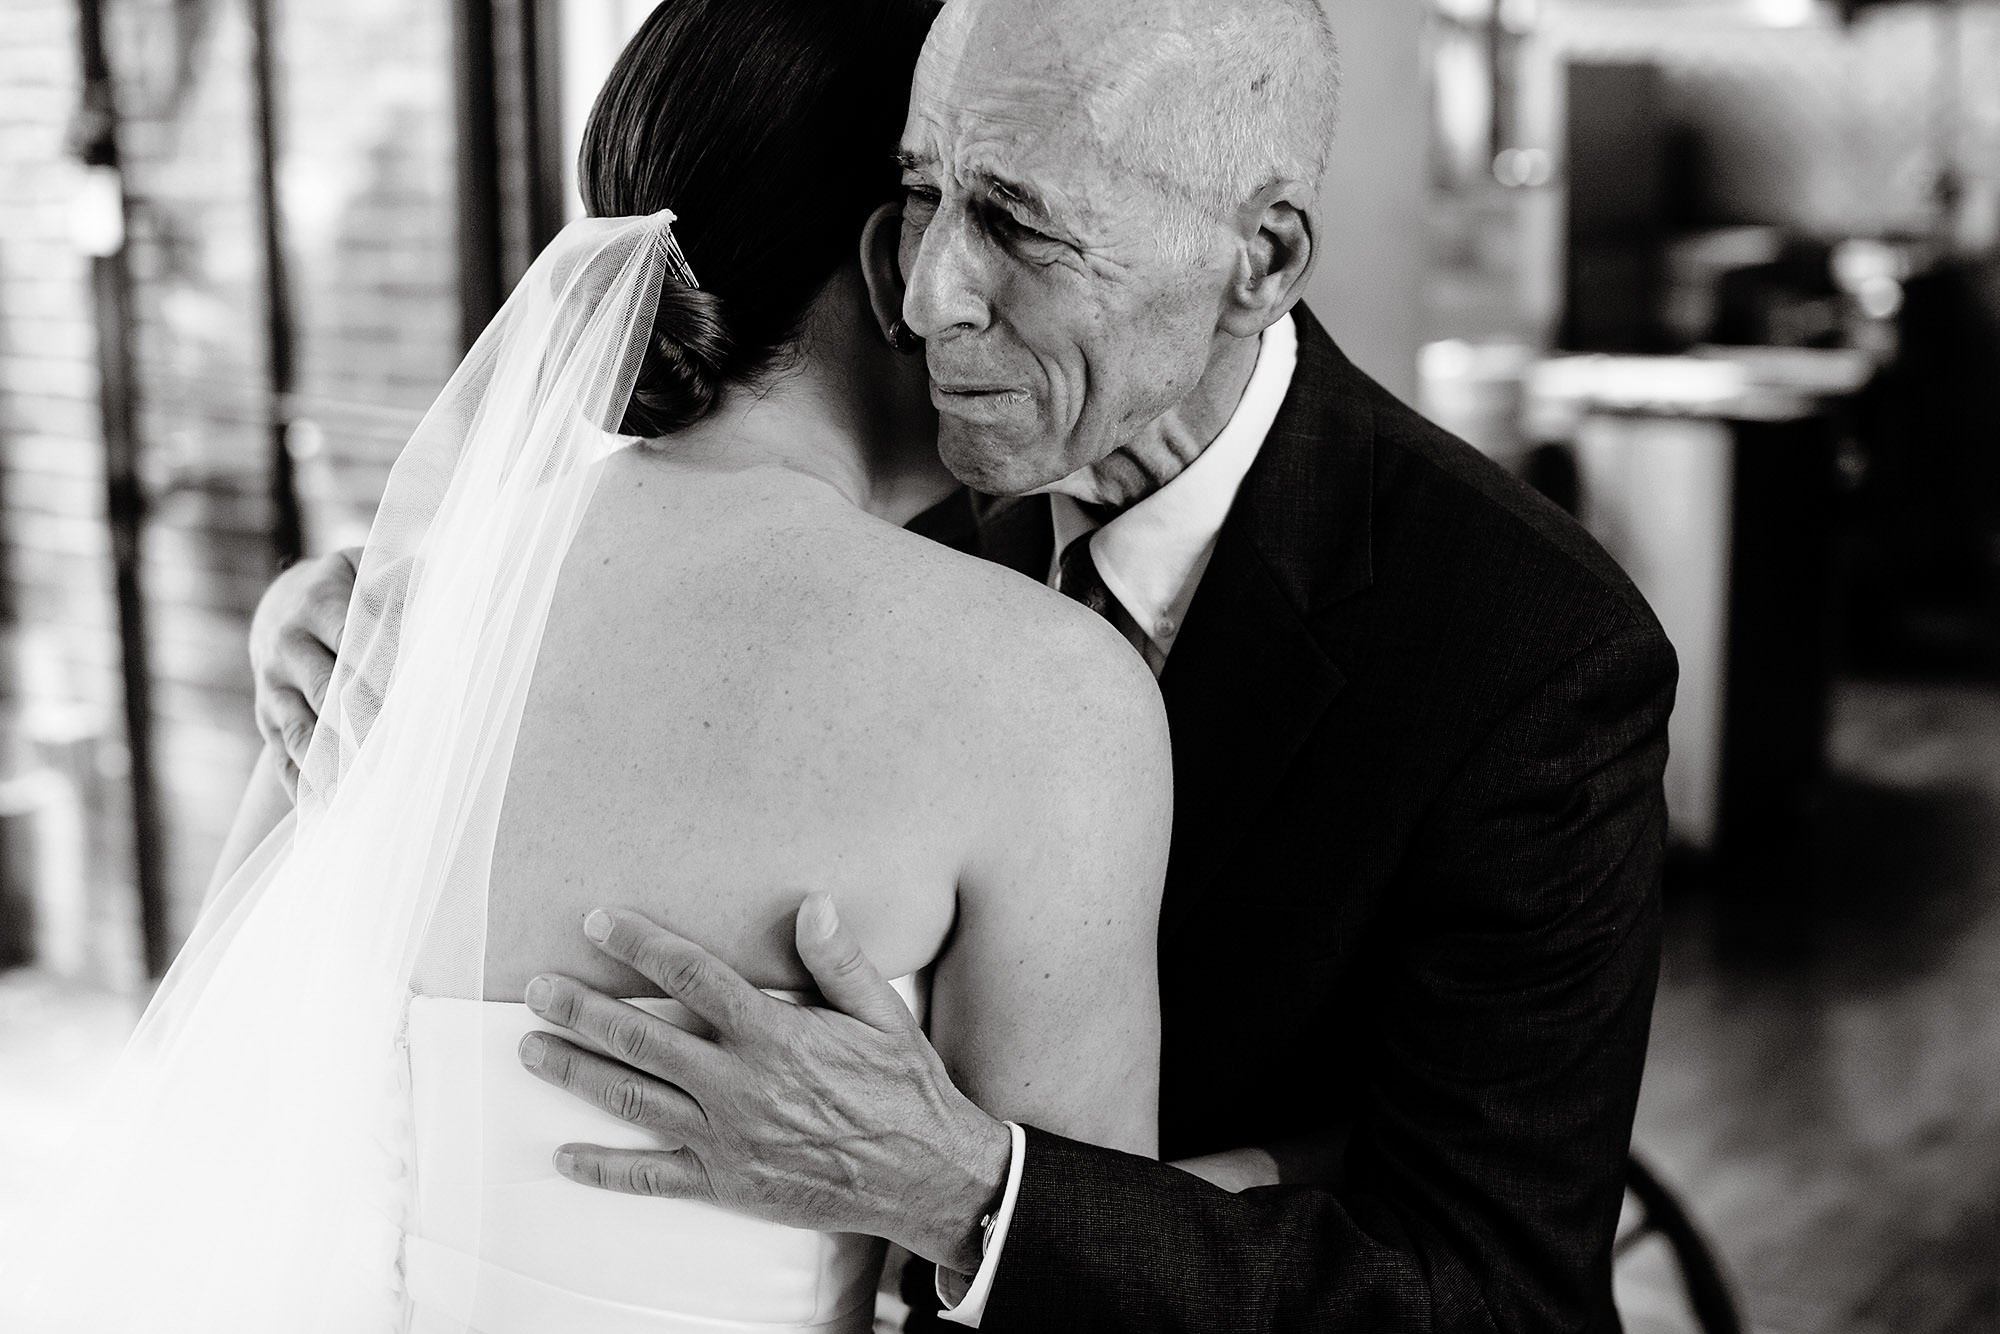 SRV Boston Wedding  I  The bride hugs her father before the wedding ceremony in Boston, MA.